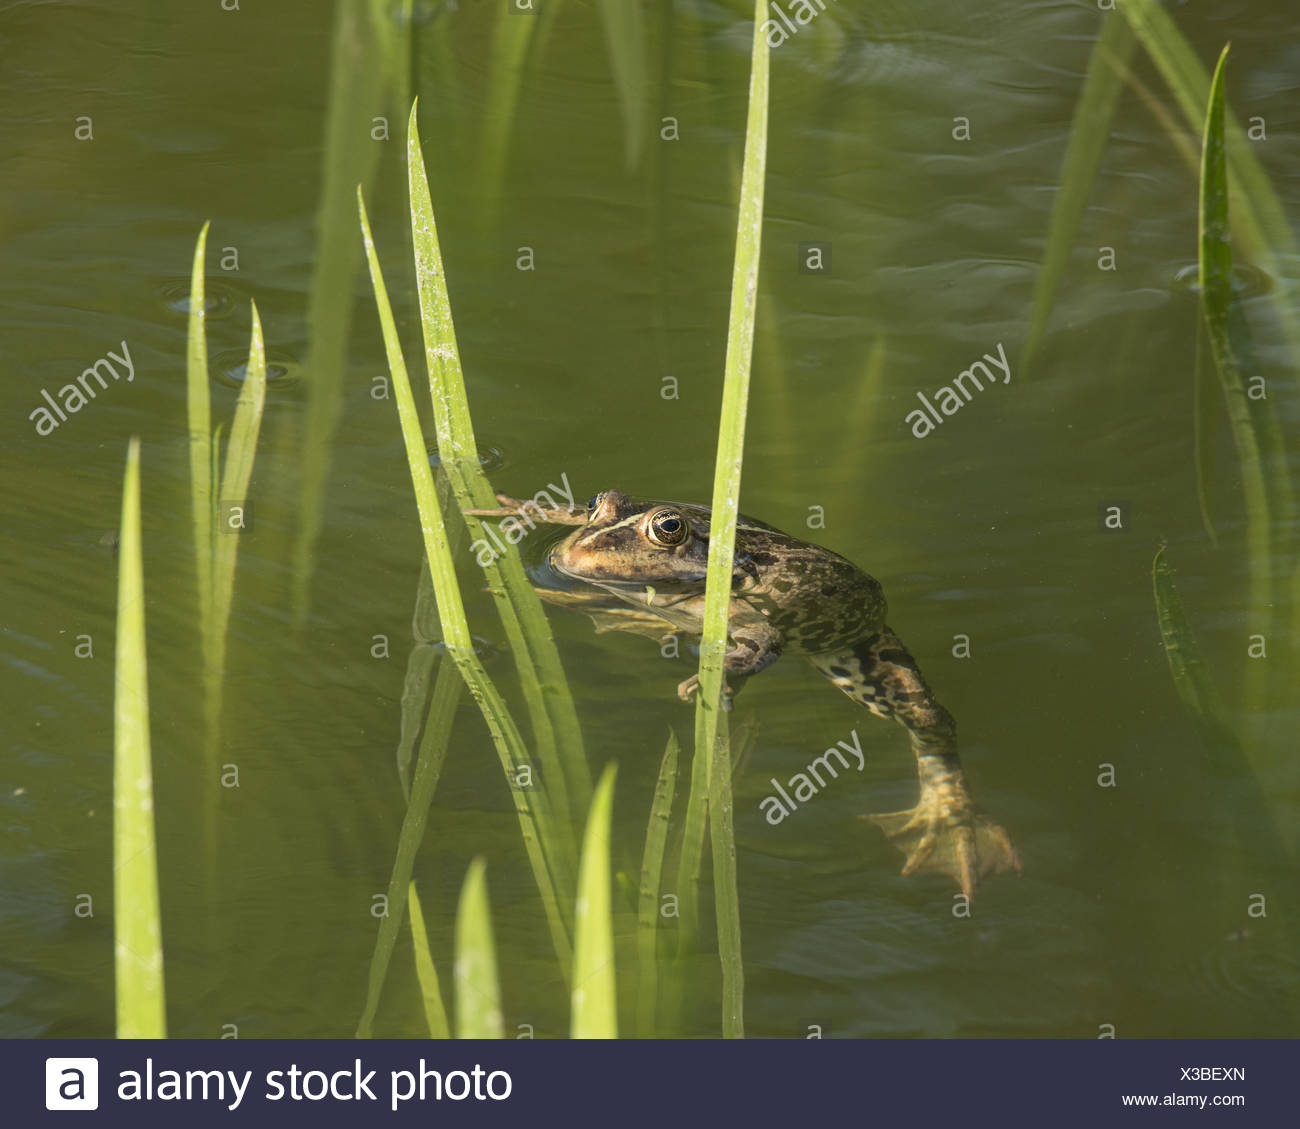 Edible frog, also common water frog or green frog (Rana esculenta) swimming between stalks, North Rhine-Westphalia, Germany - Stock Image